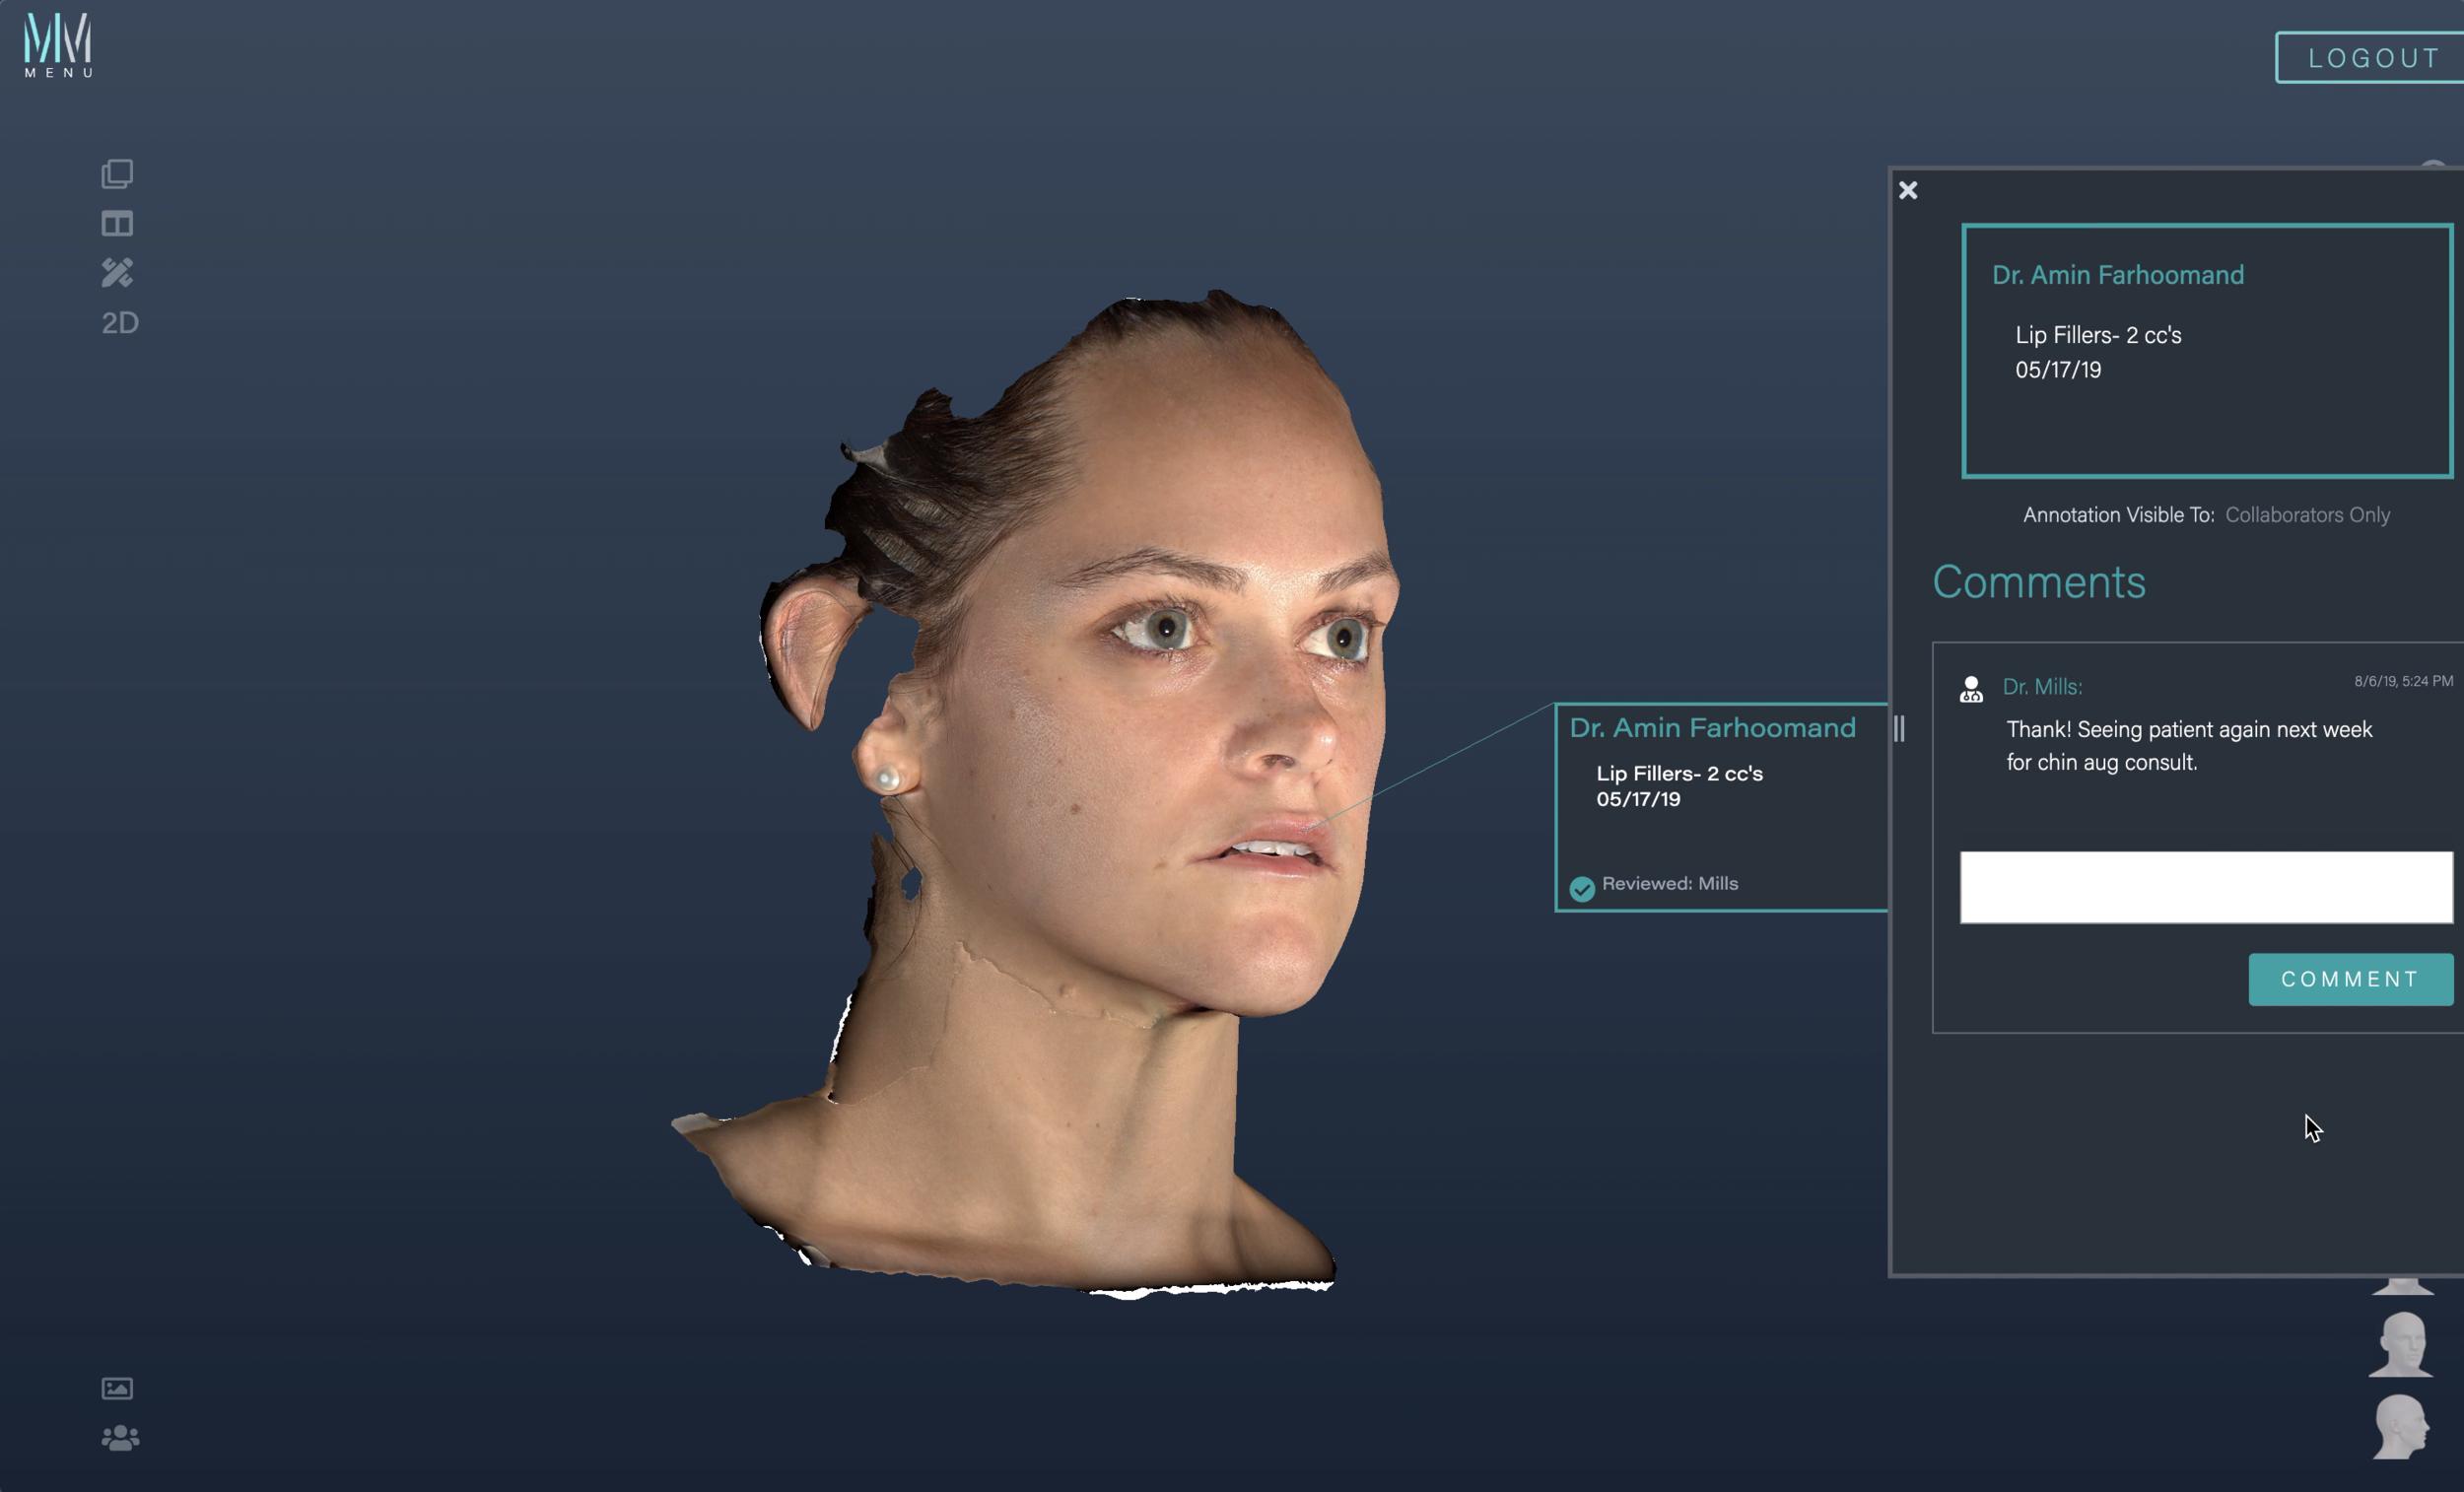 MirrorMe Referral Platform